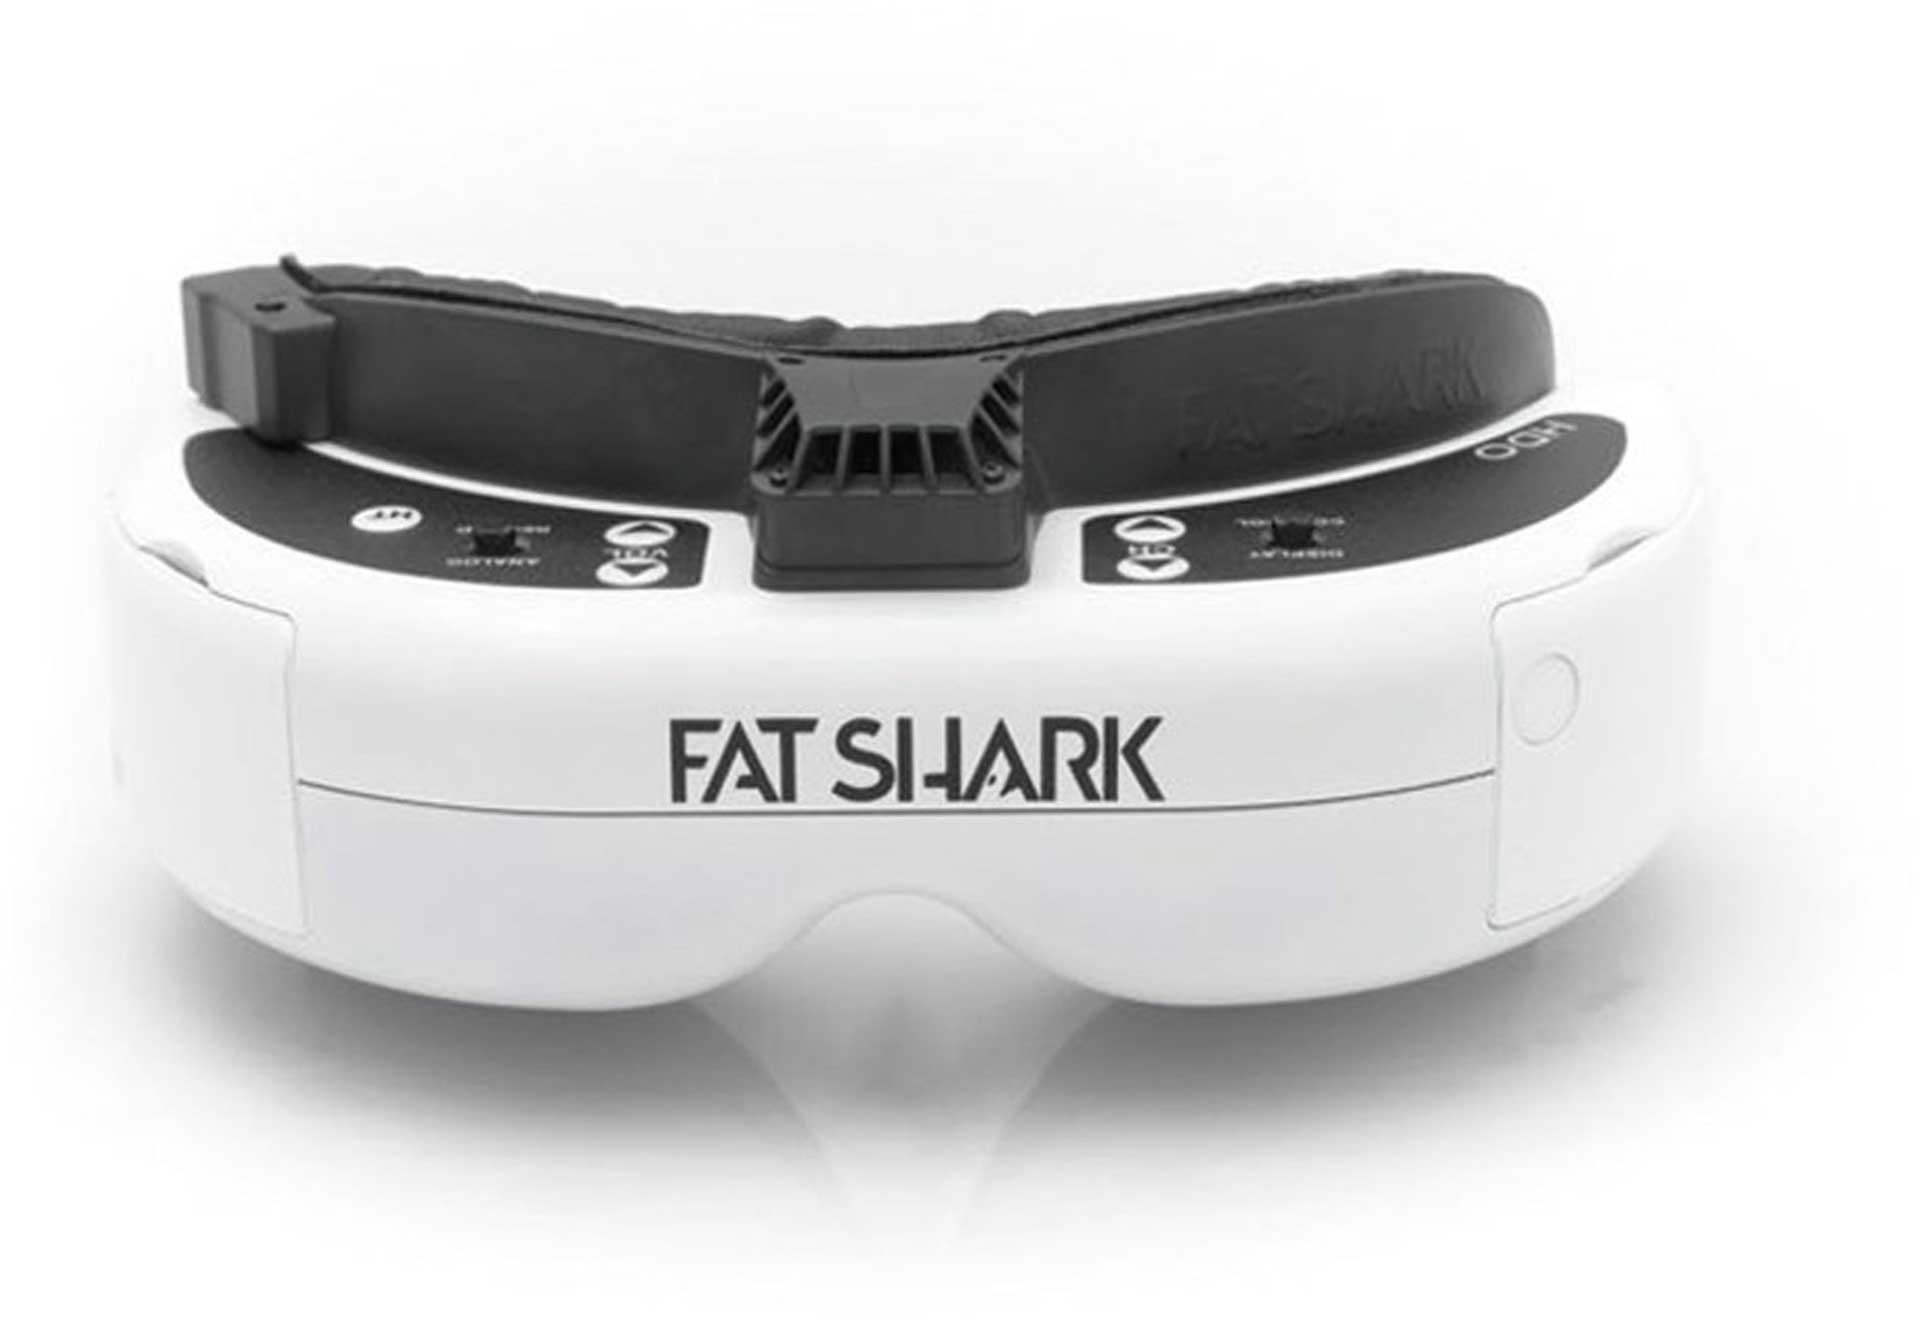 FAT SHARK HDO GOGGLES FPV VIDEO GLASSES